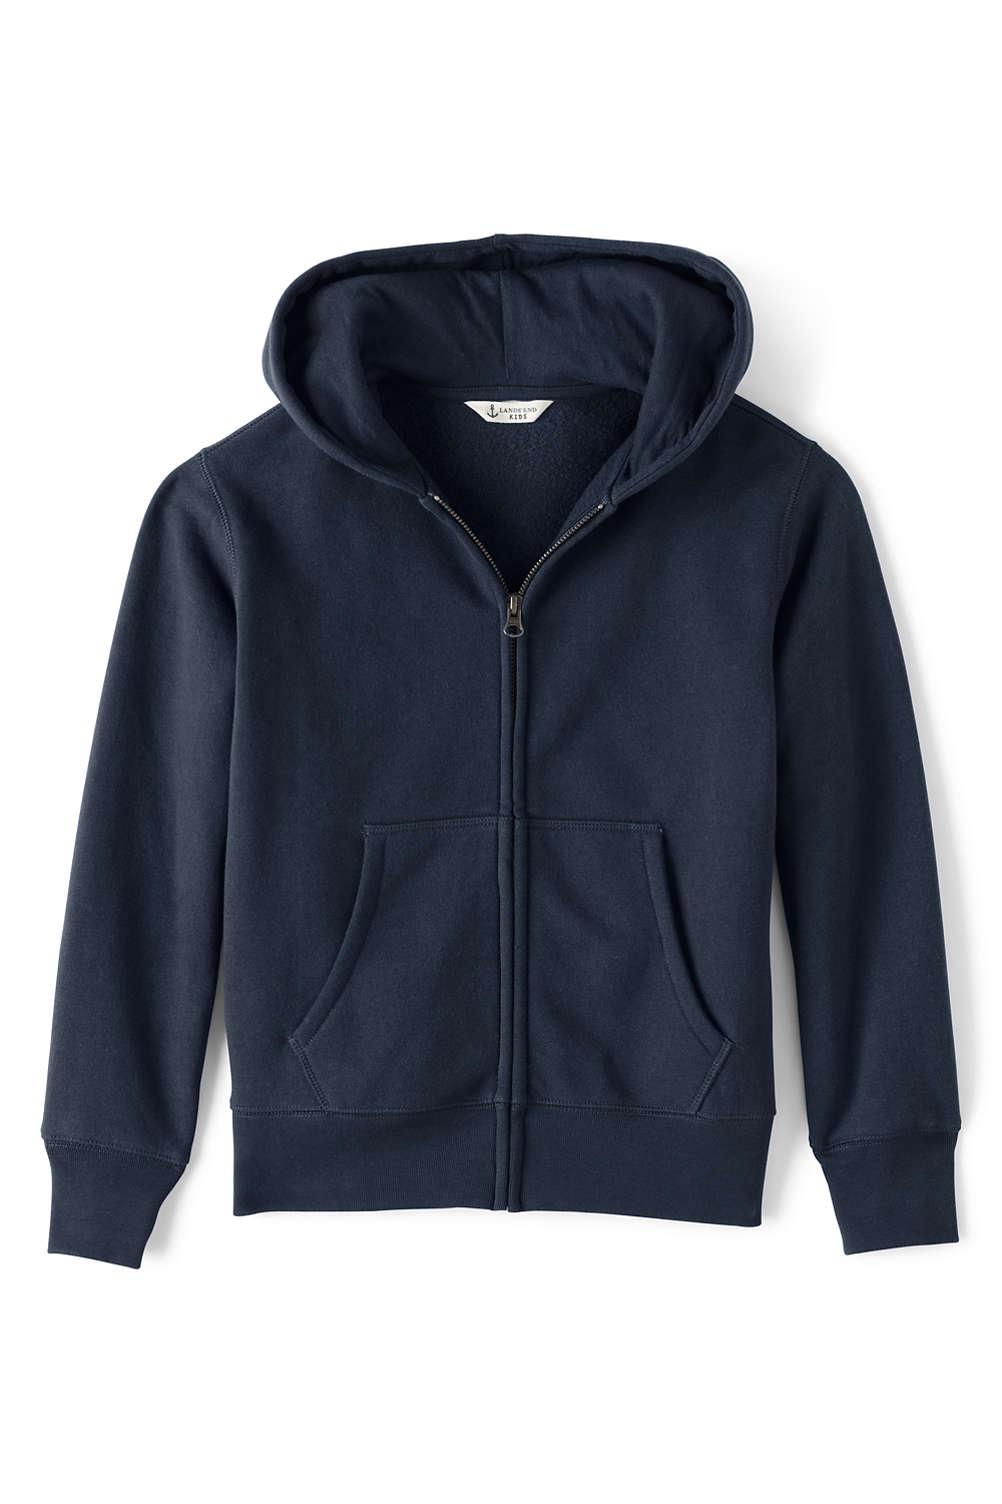 VP.ZSWEAT-M Fleece Jacket Facom Medium by Dickies